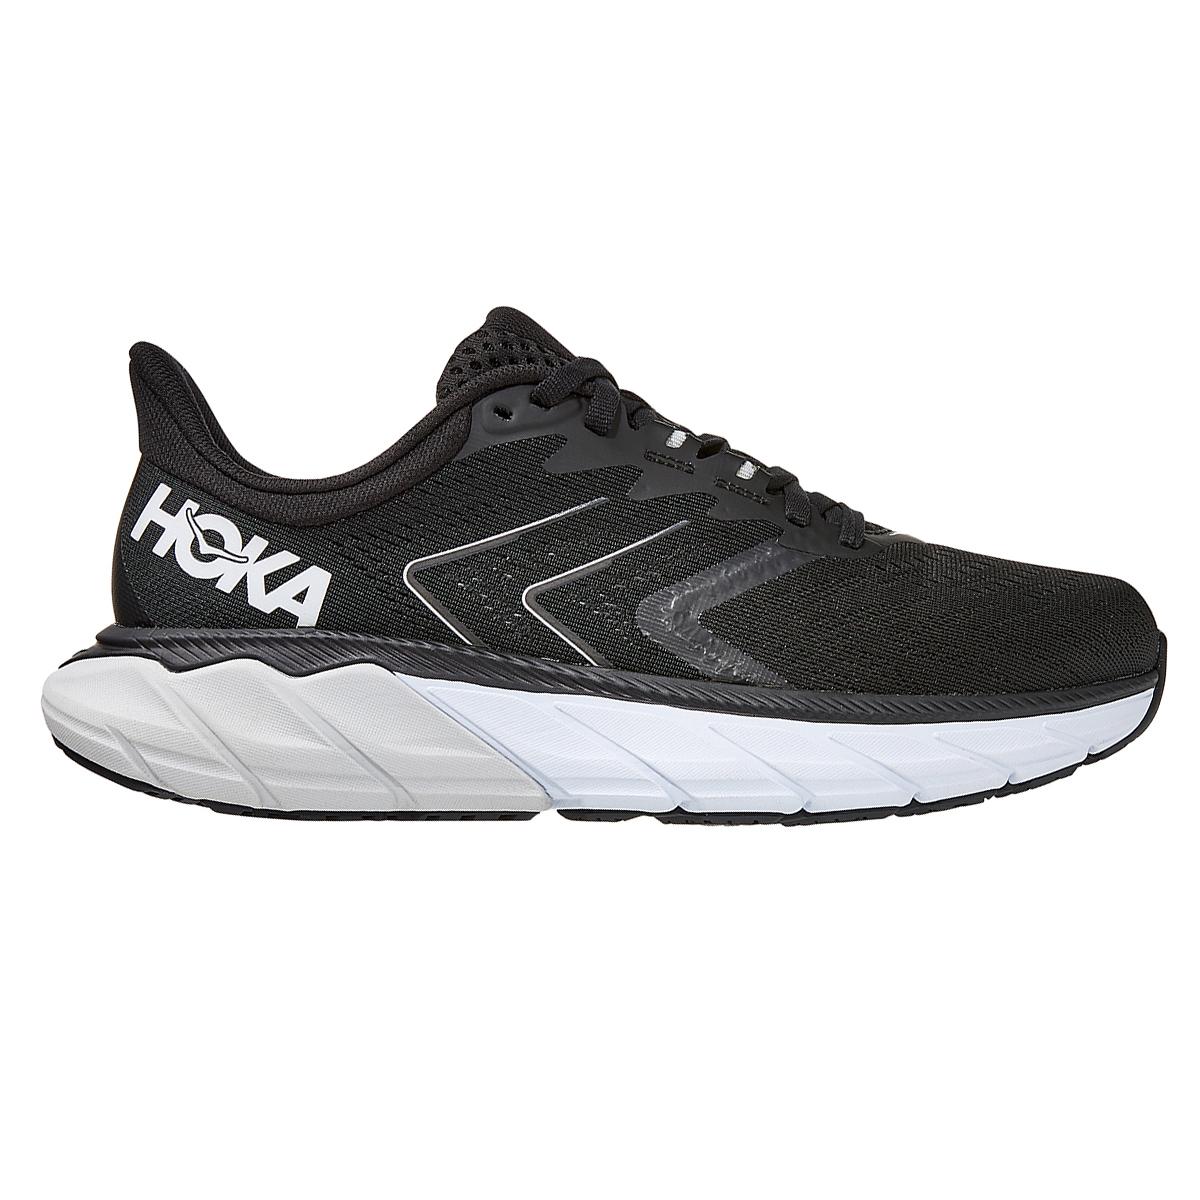 Women's Hoka One One Arahi 5 Running Shoe - Color: Black/White - Size: 5 - Width: Regular, Black/White, large, image 1